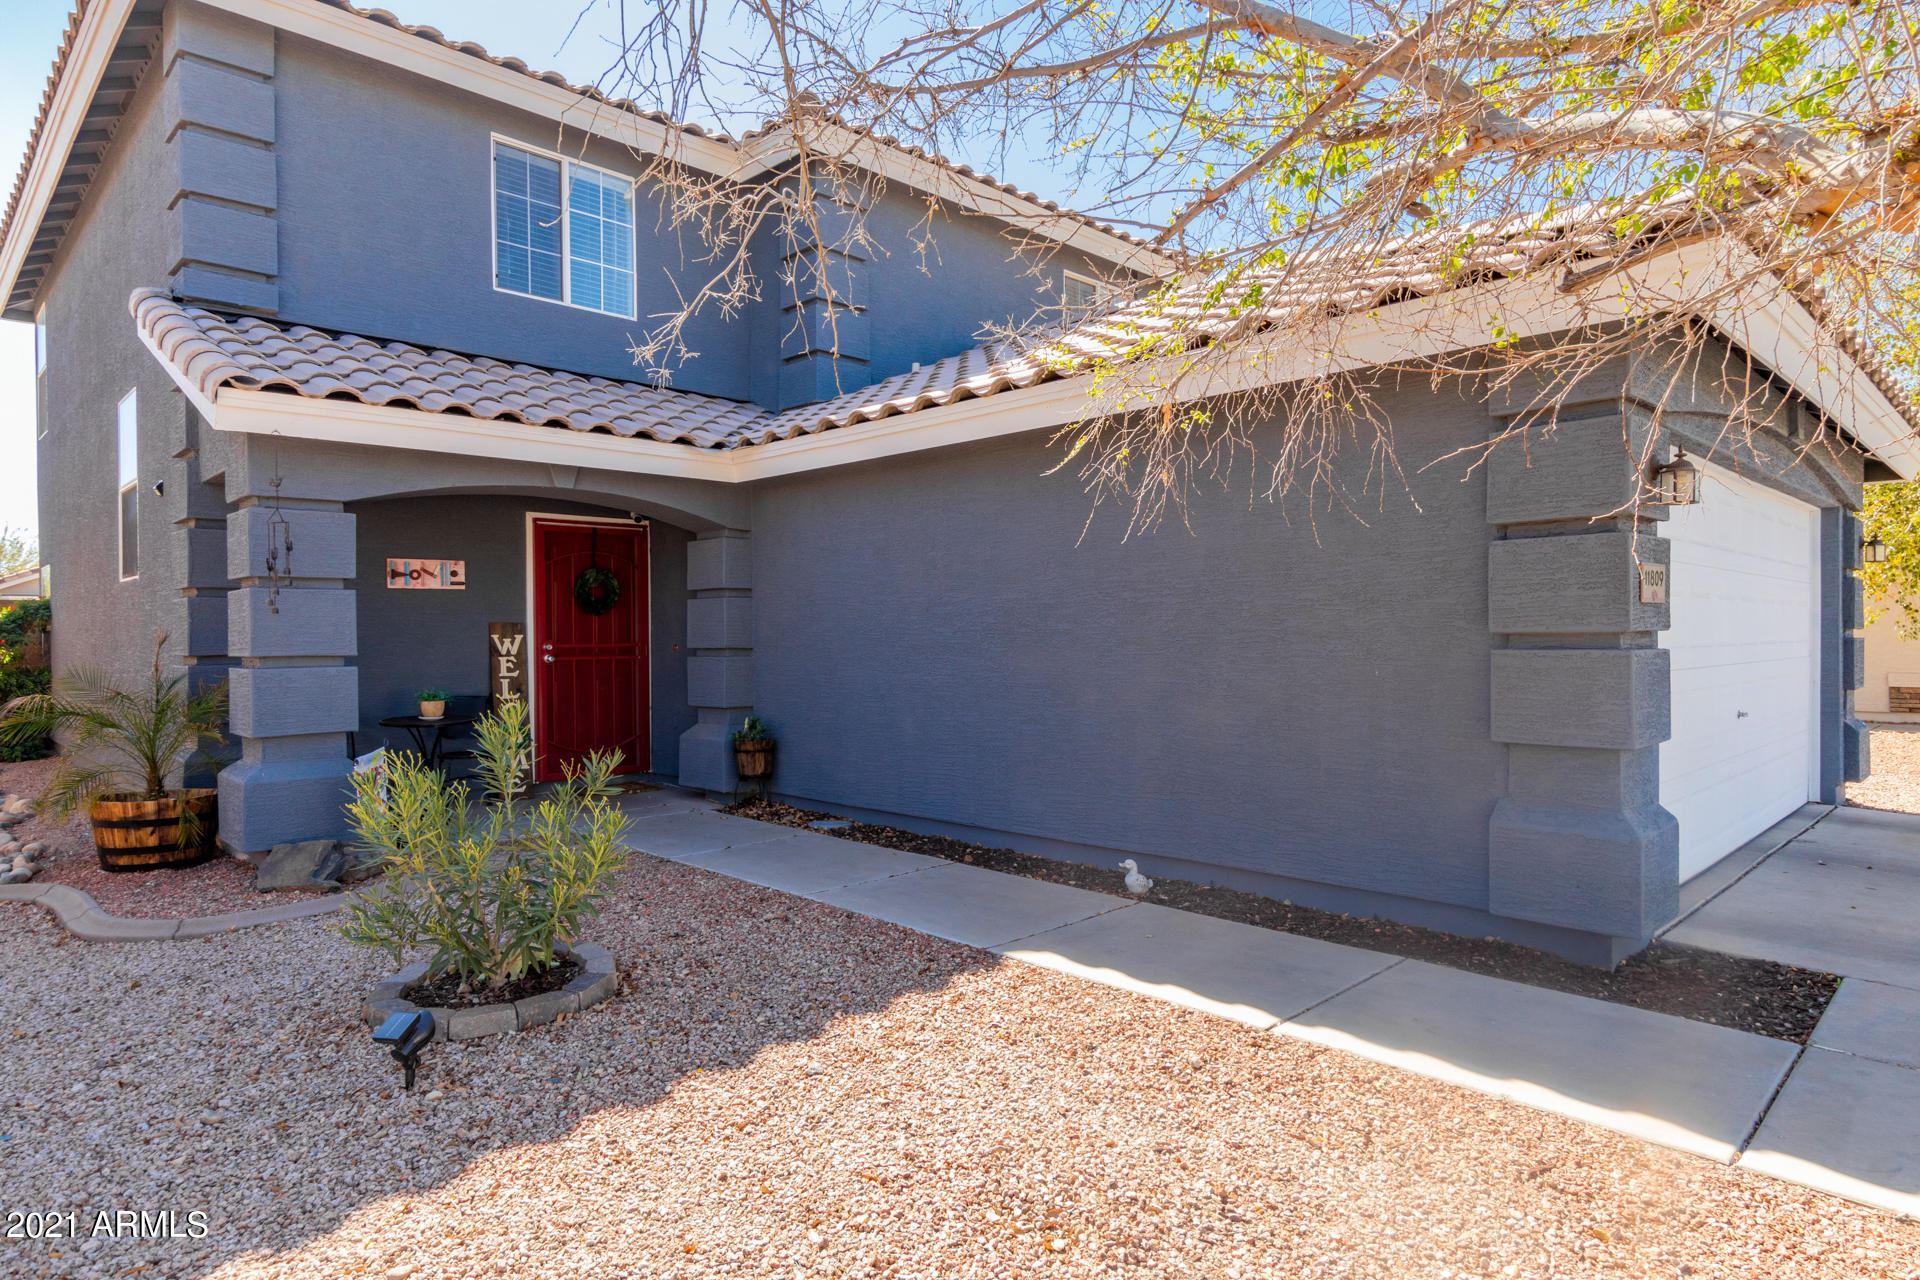 Photo of 11809 W SHAW BUTTE Drive, El Mirage, AZ 85335 (MLS # 6200806)